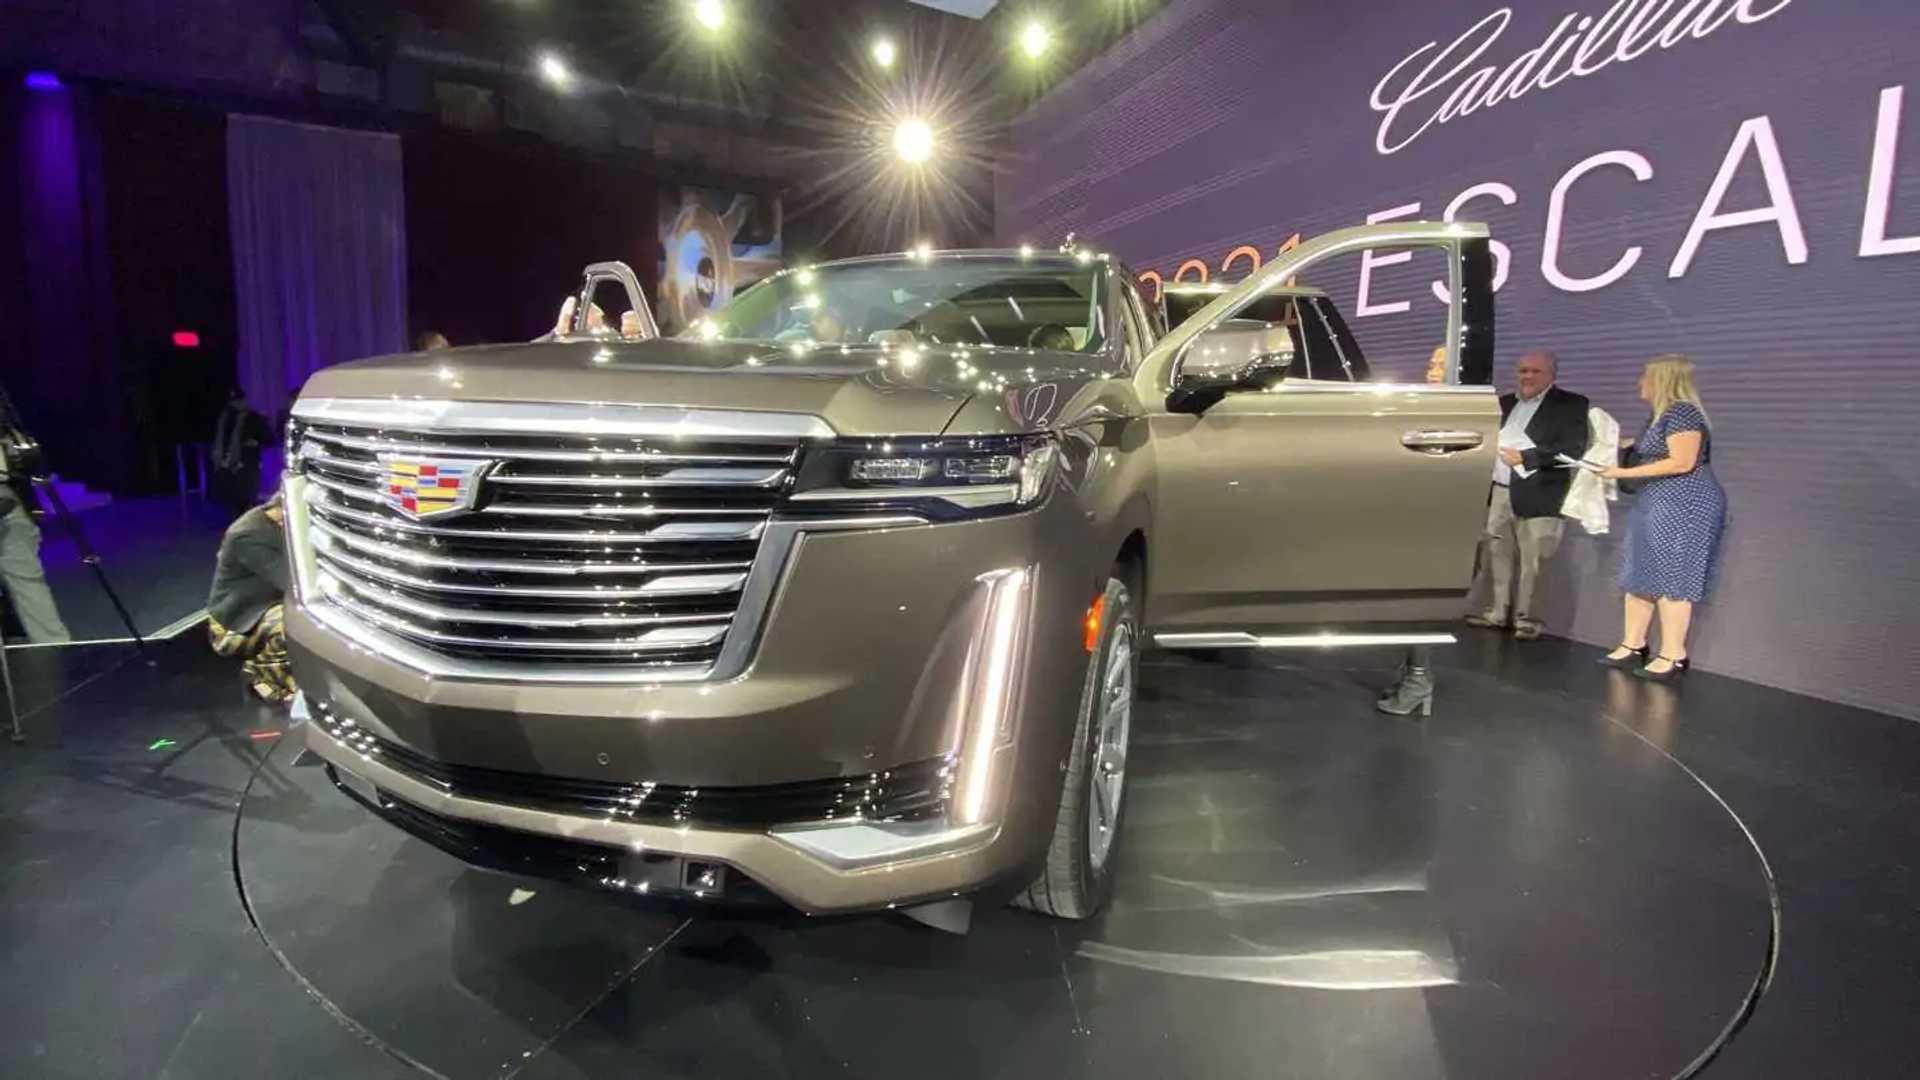 2021 Cadillac Escalade Live Image